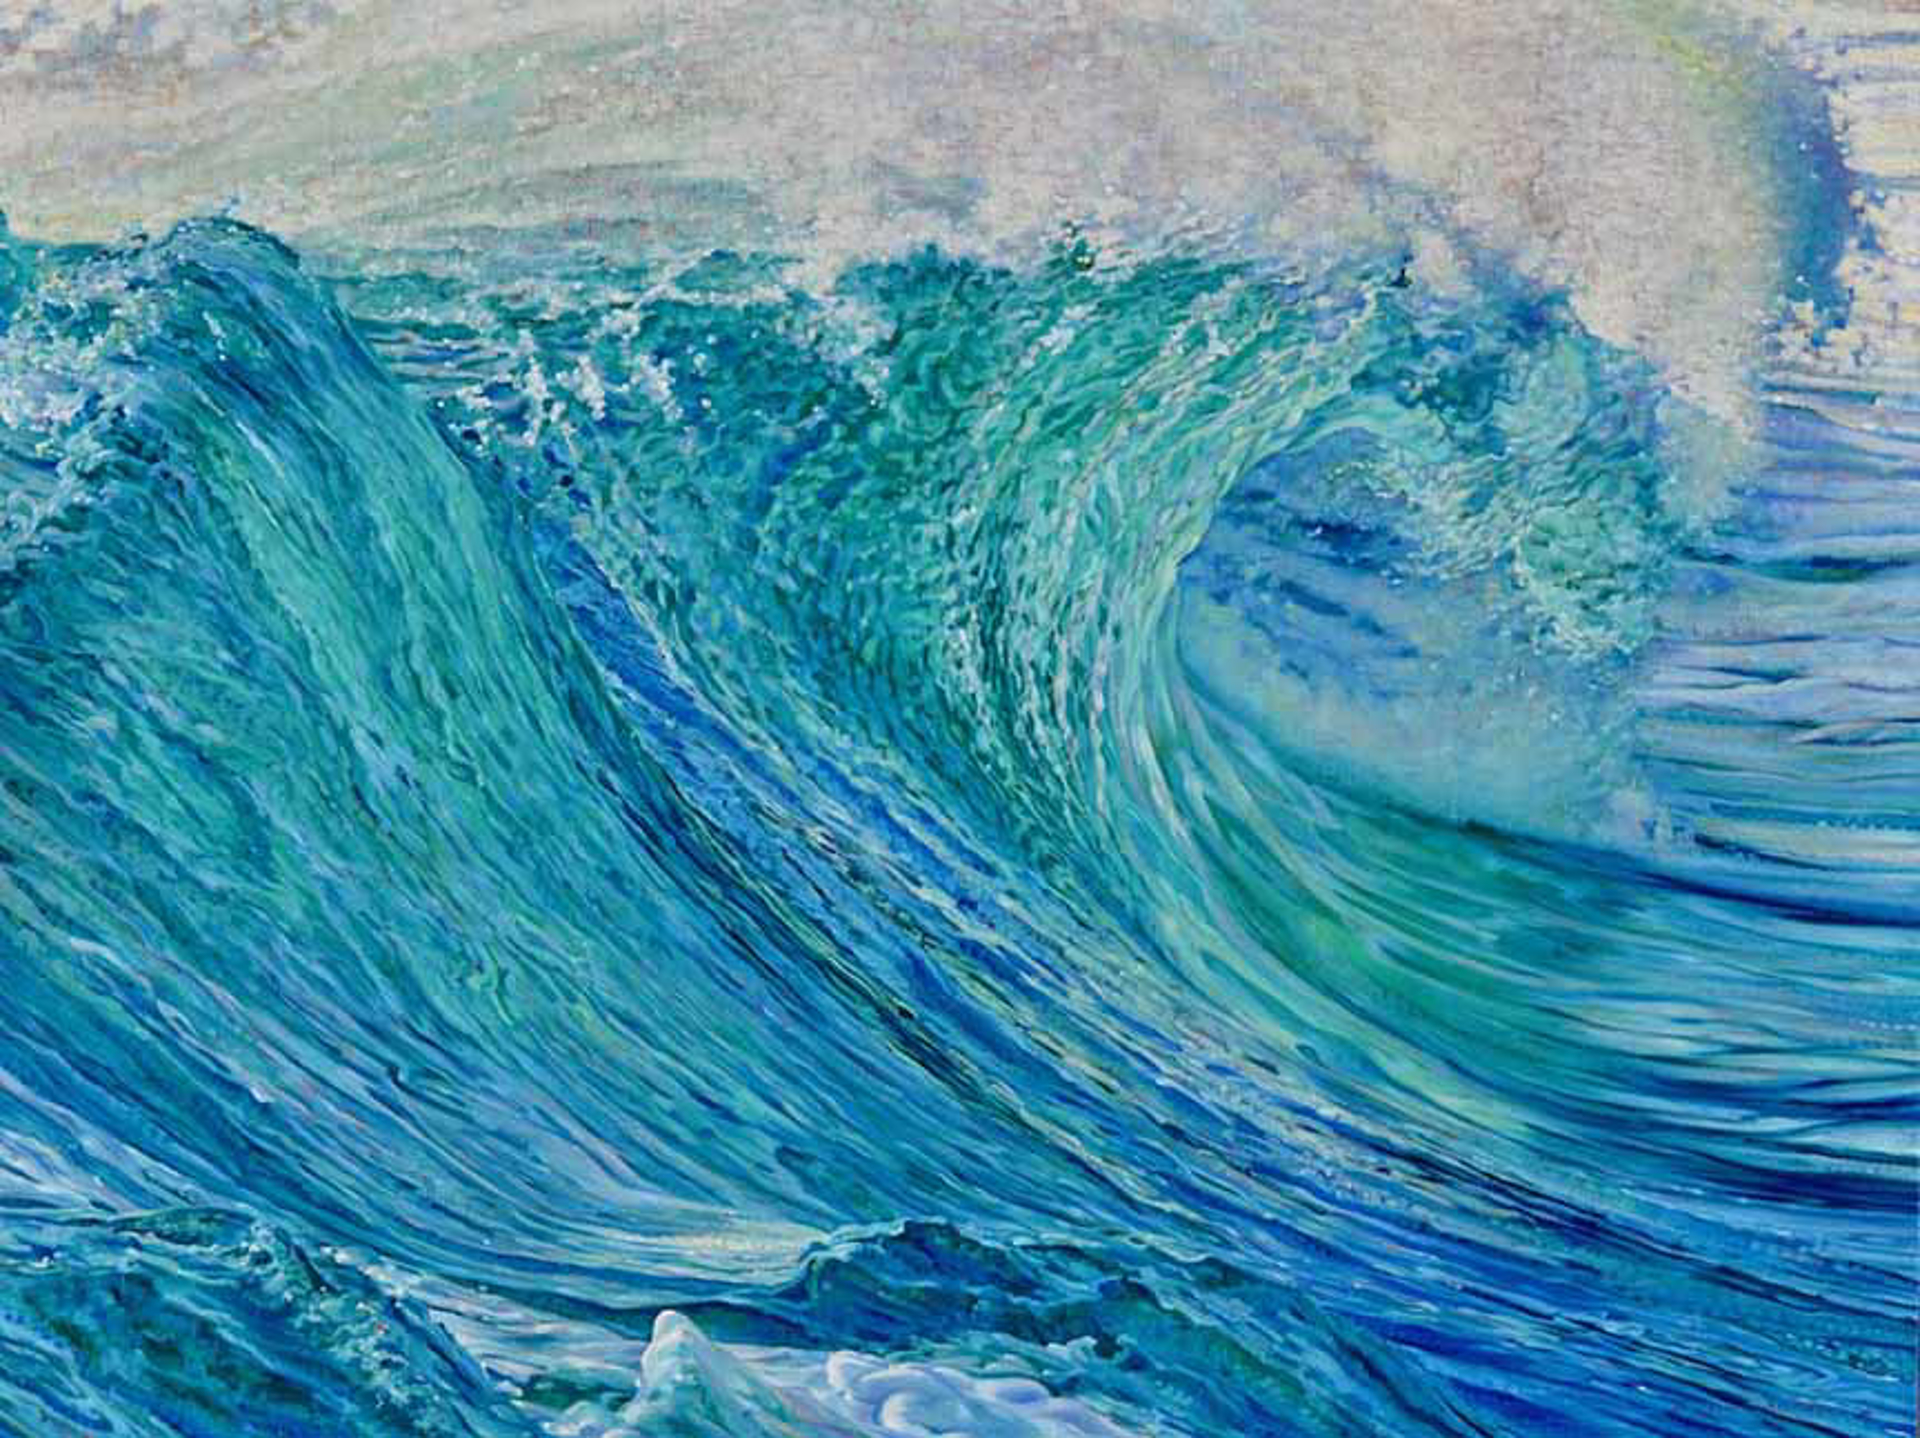 The Secret Life Of Waves by Caroline Zimmermann